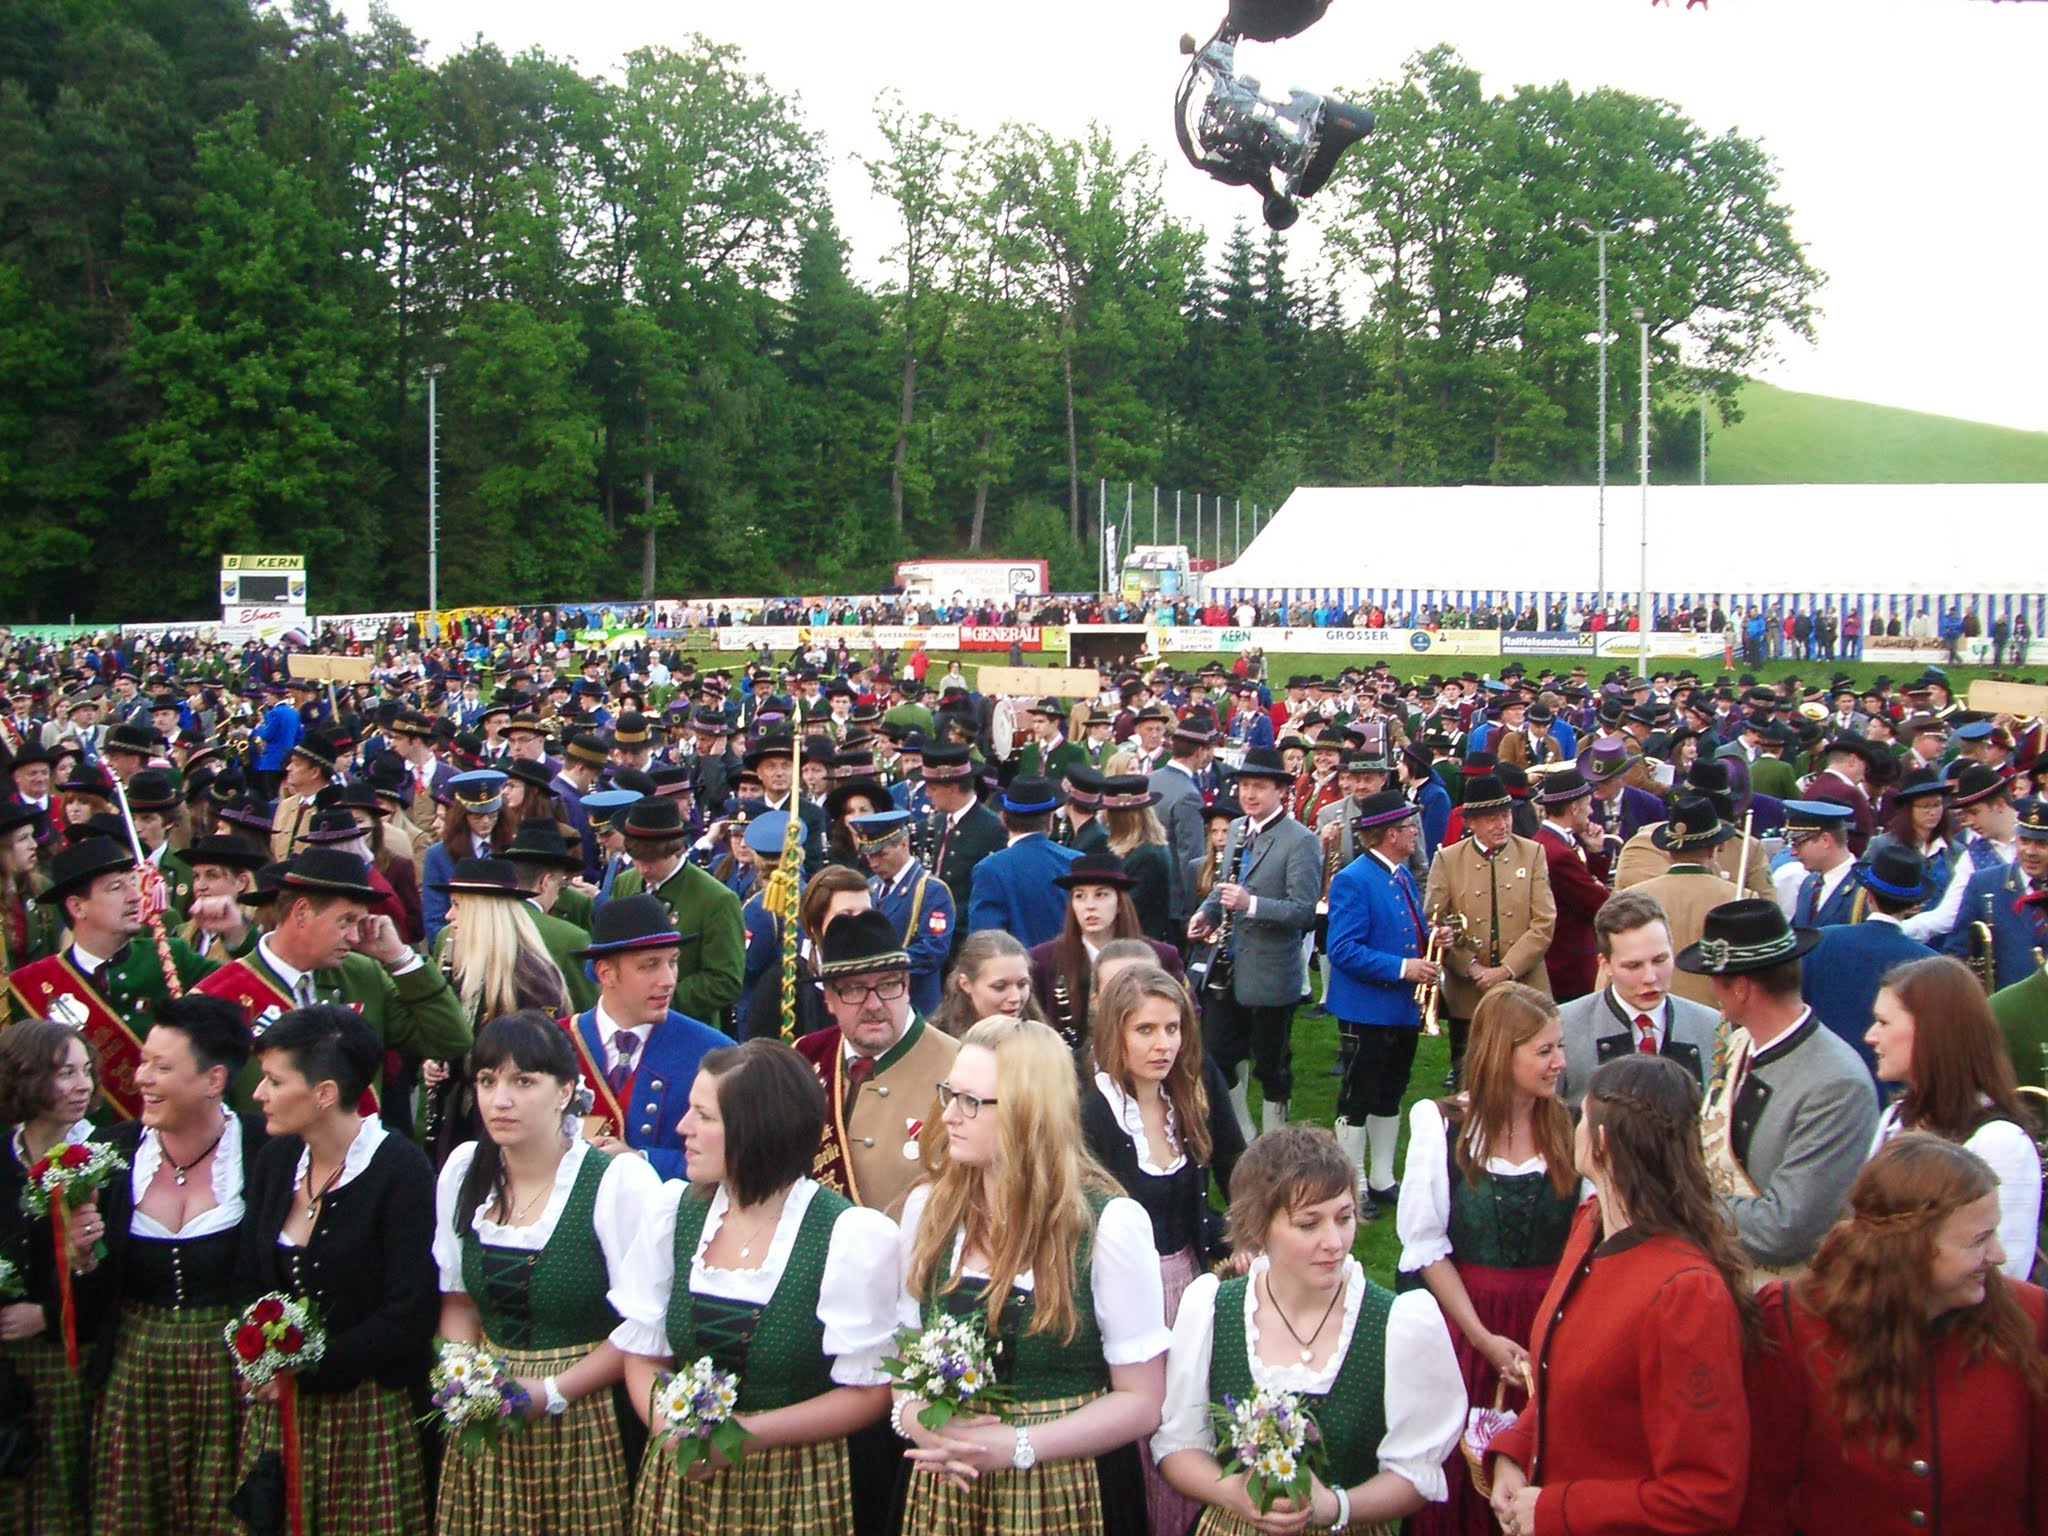 2014.05.31 Marschwertung in Schönau - IMGP5023